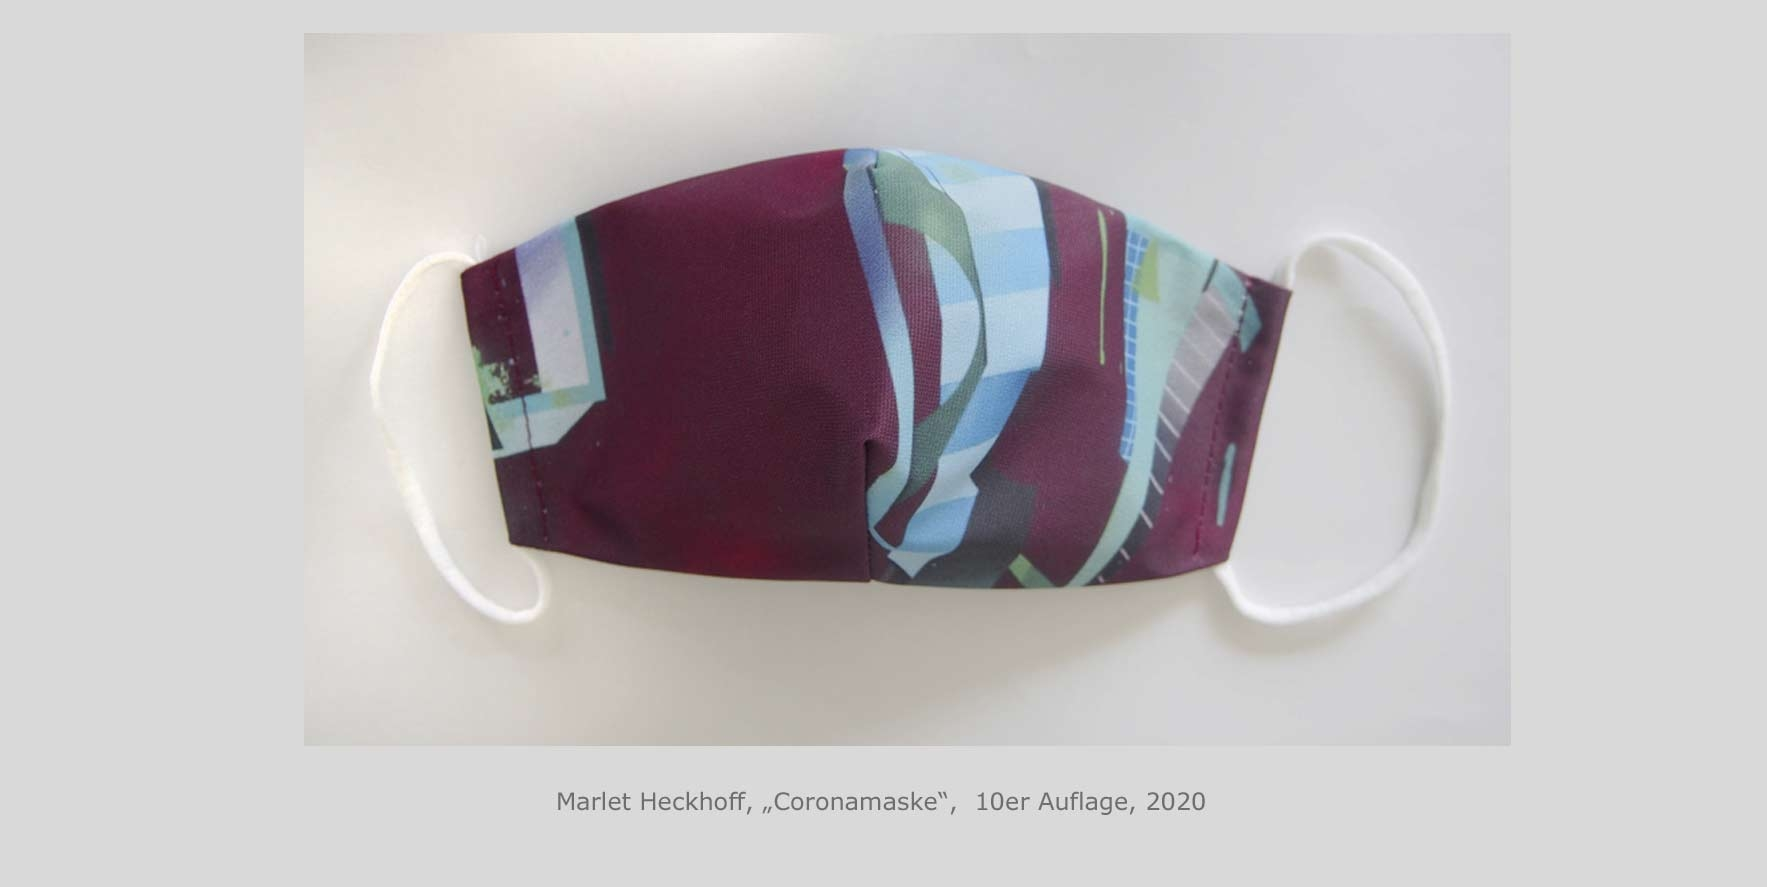 Marlet Heckhoff, Corona Maske